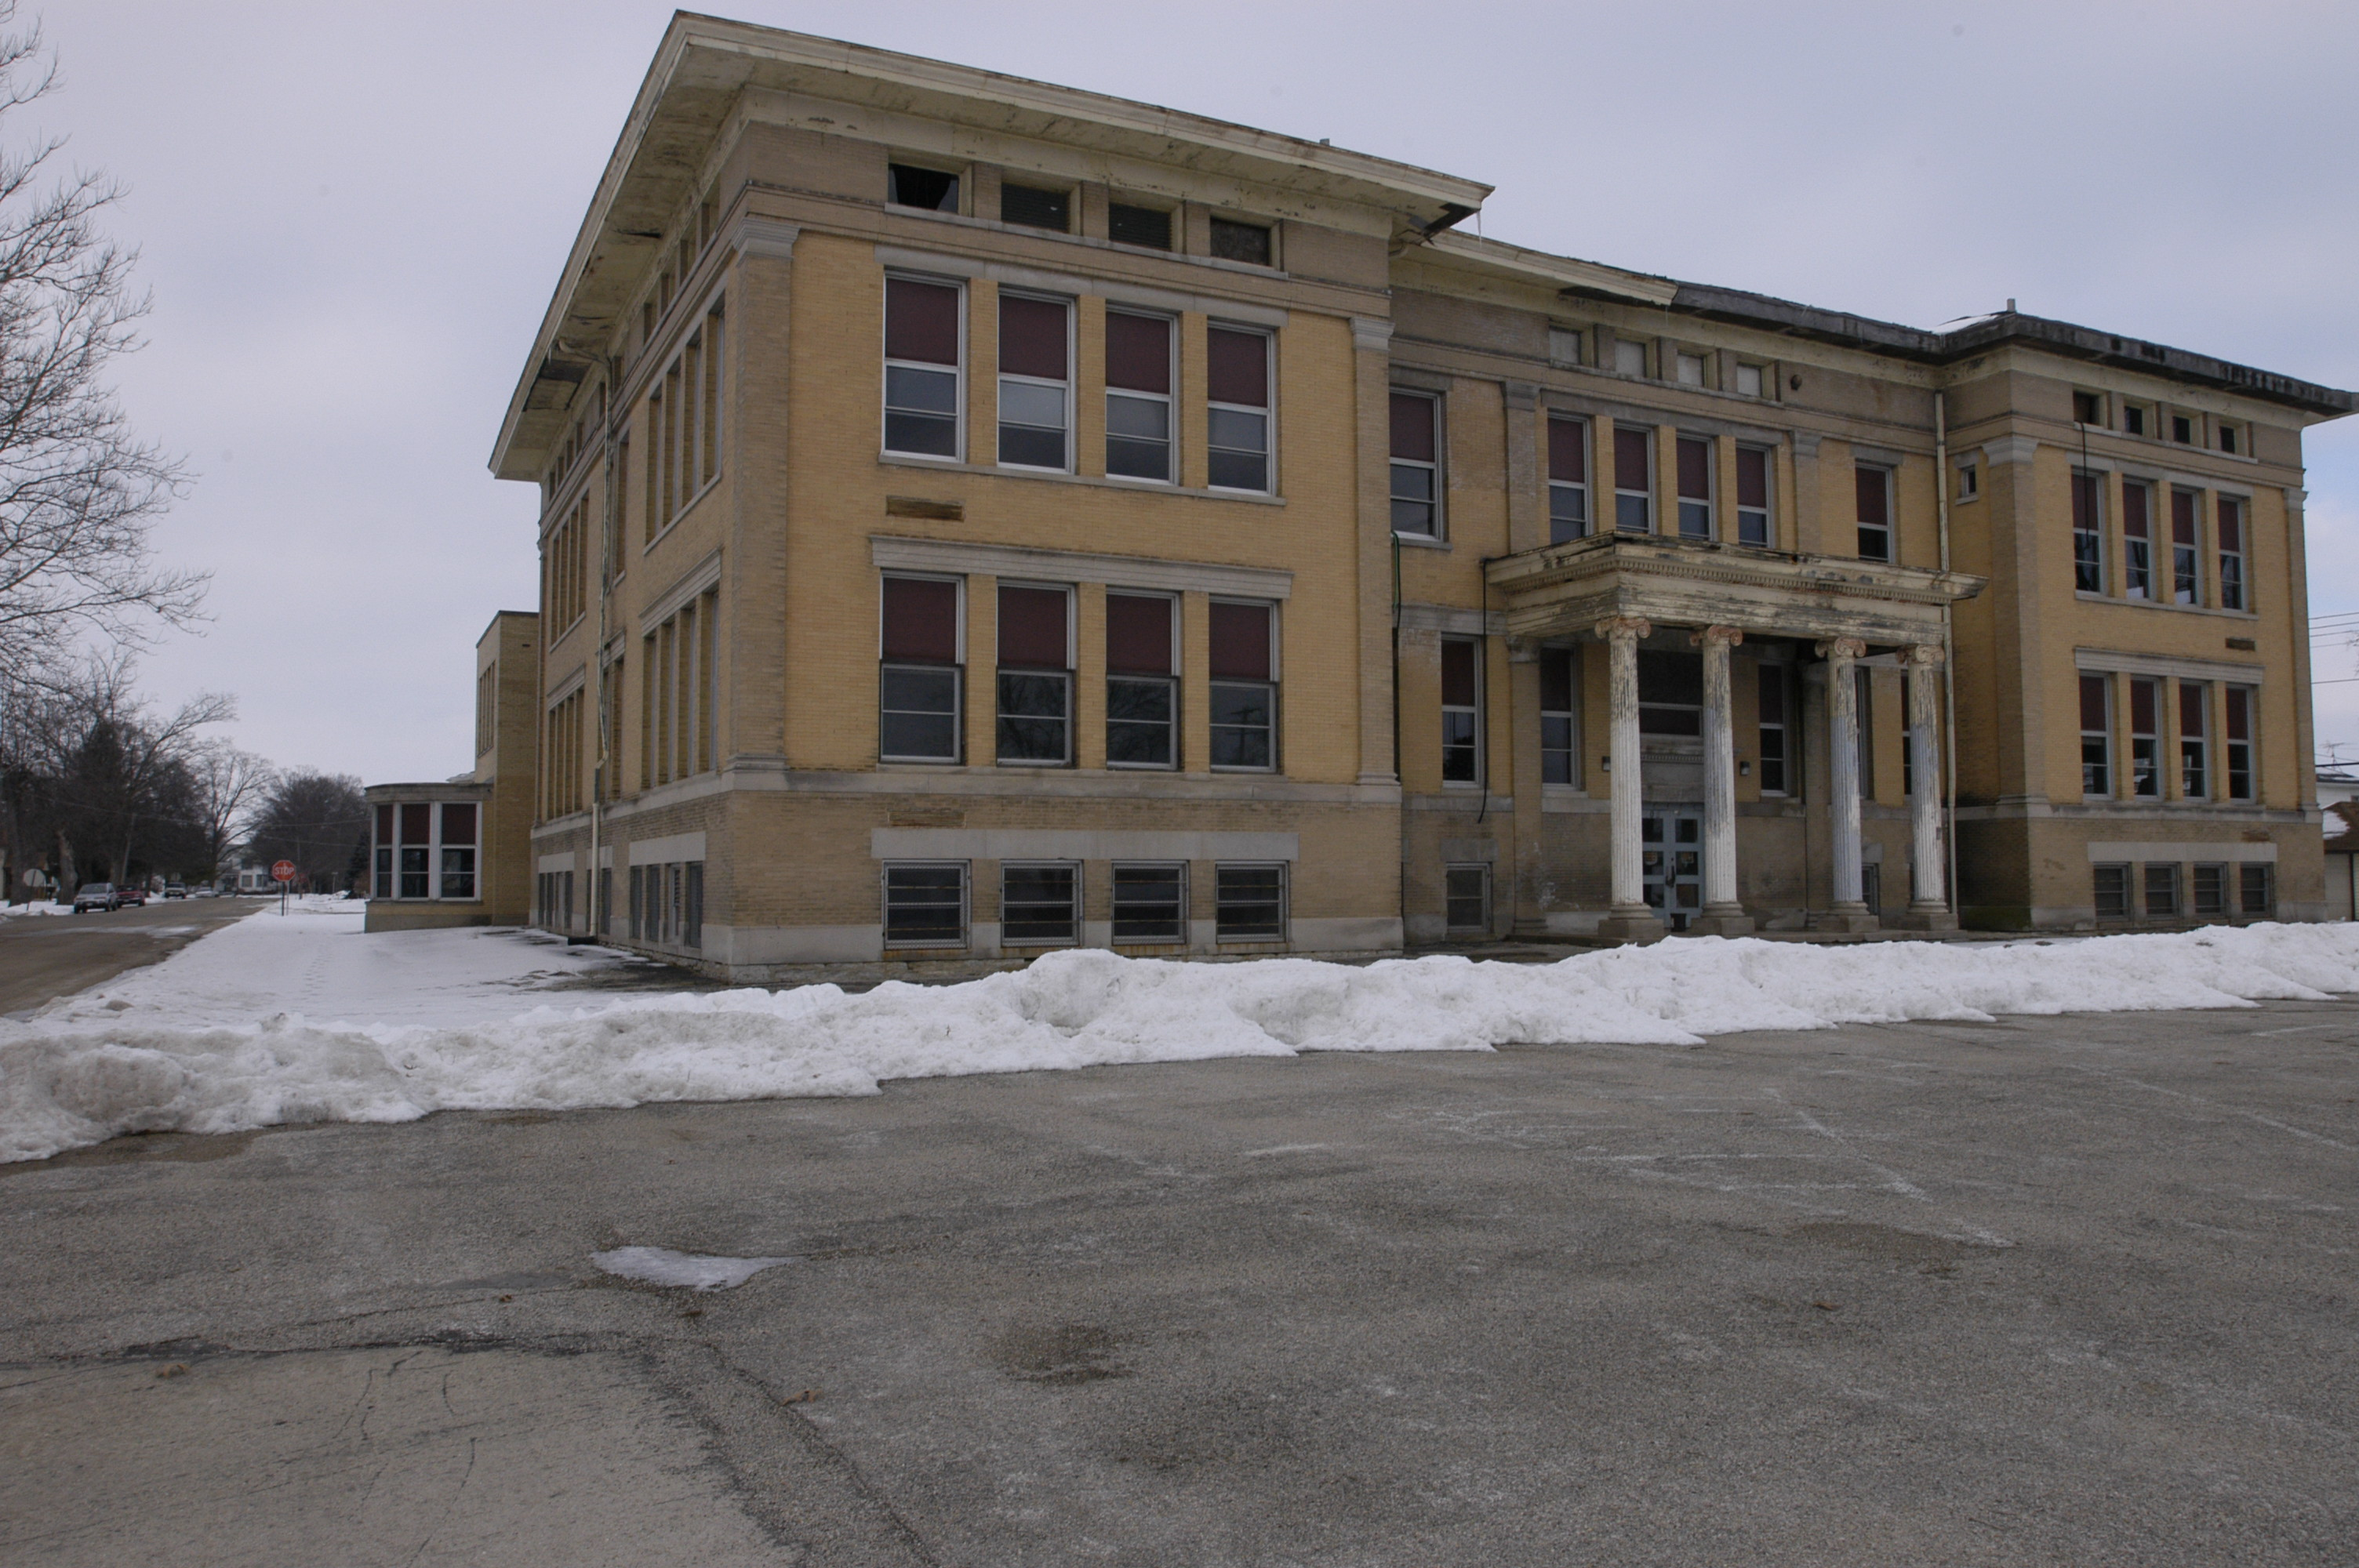 Illinois ogle county polo - File Ogle County Polo Il Abandoned School3 Jpg